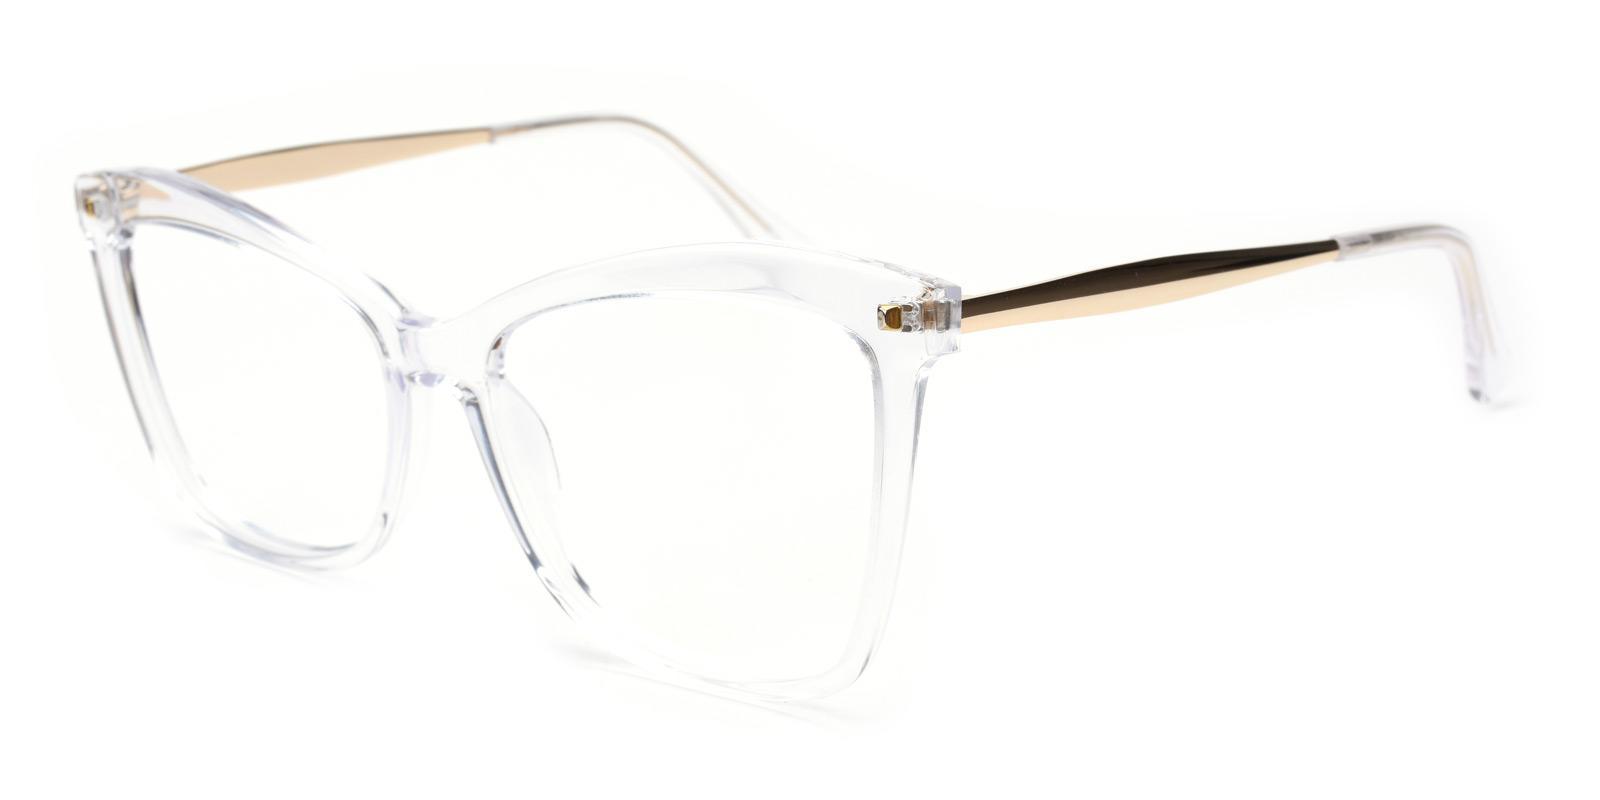 Gleen-Translucent-Cat-Combination-Eyeglasses-additional1